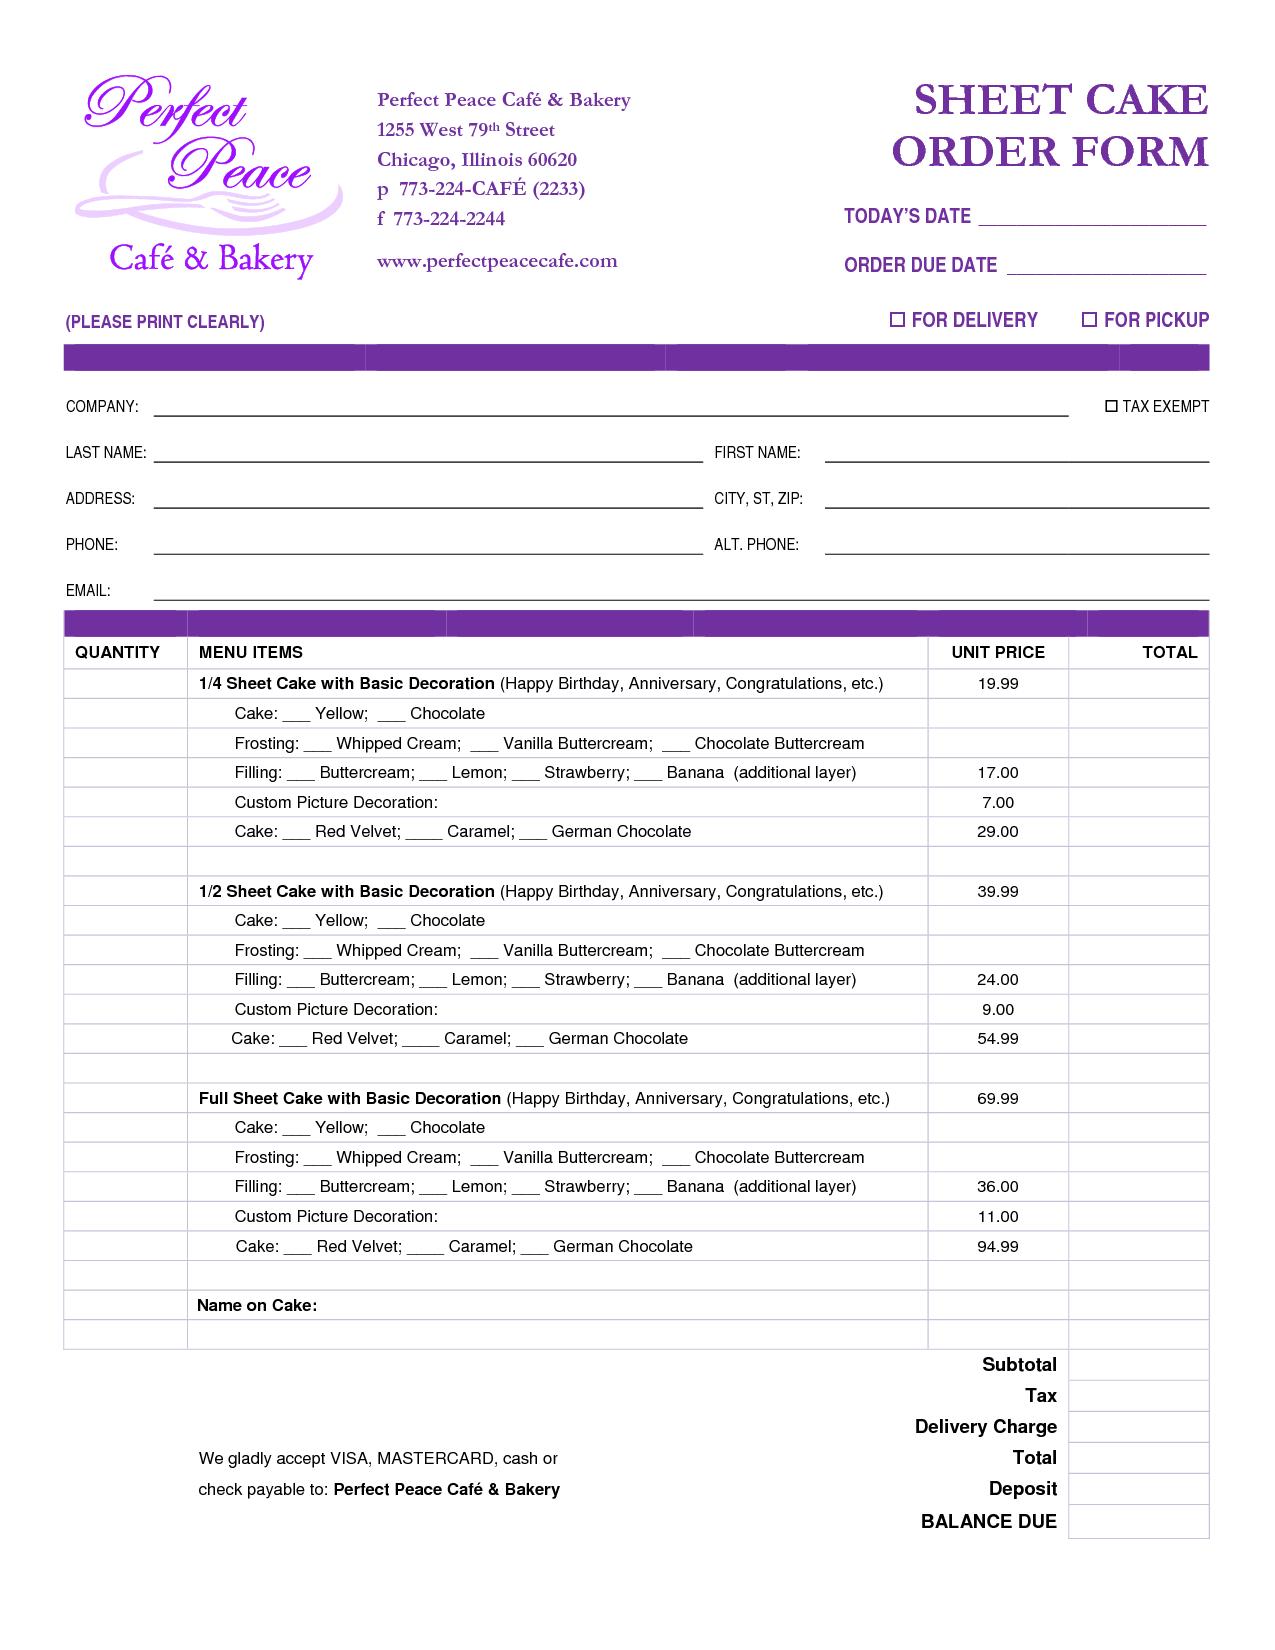 free printable order form